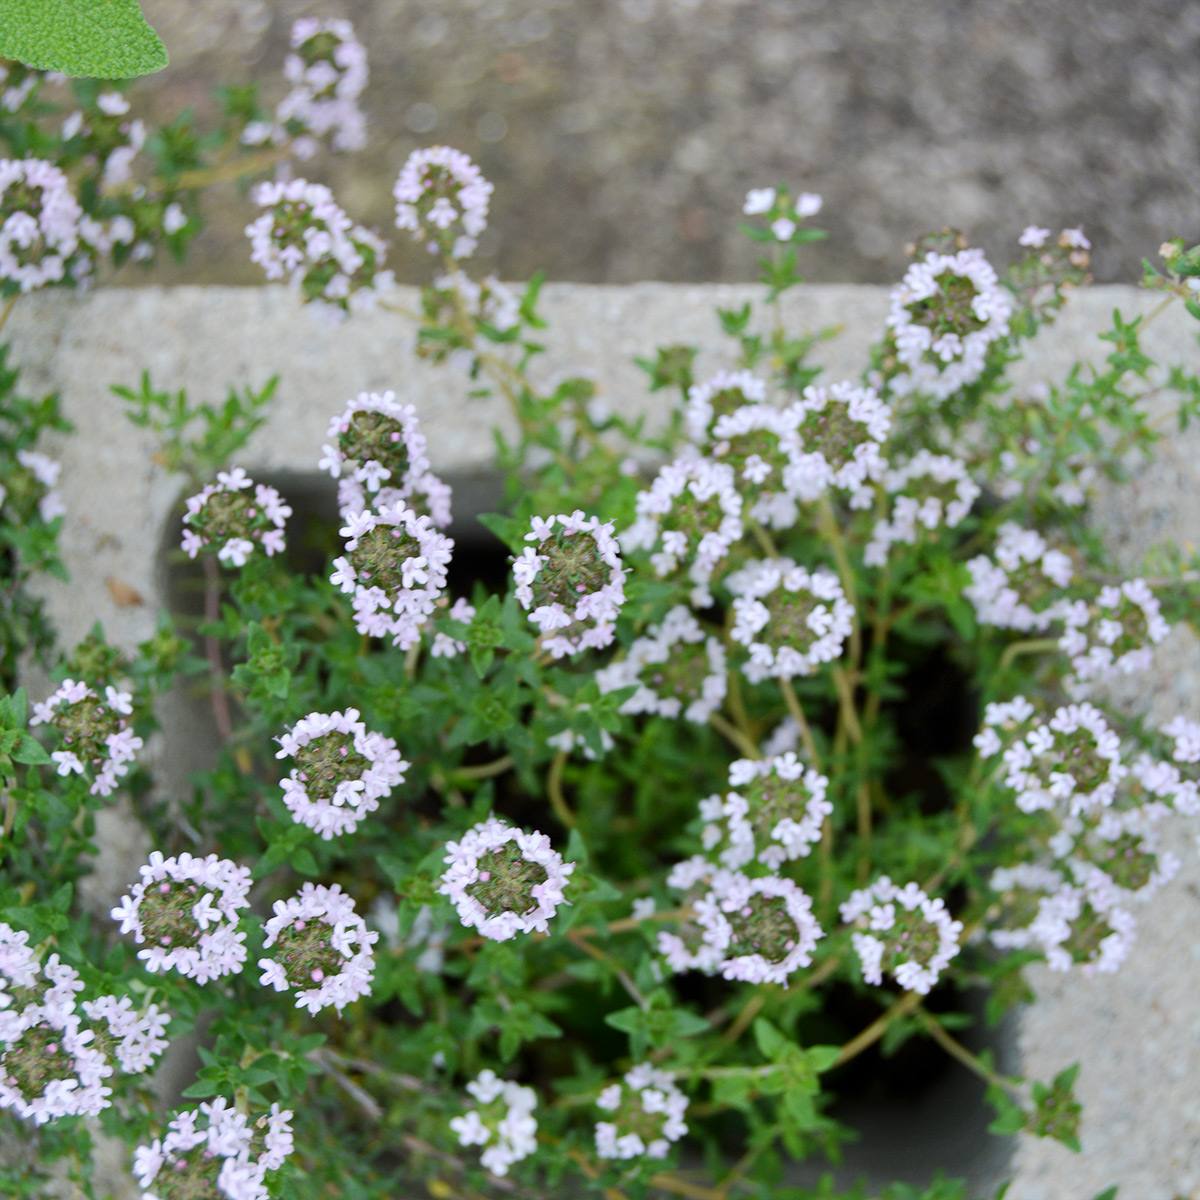 Dainty thyme flowers in the garden.